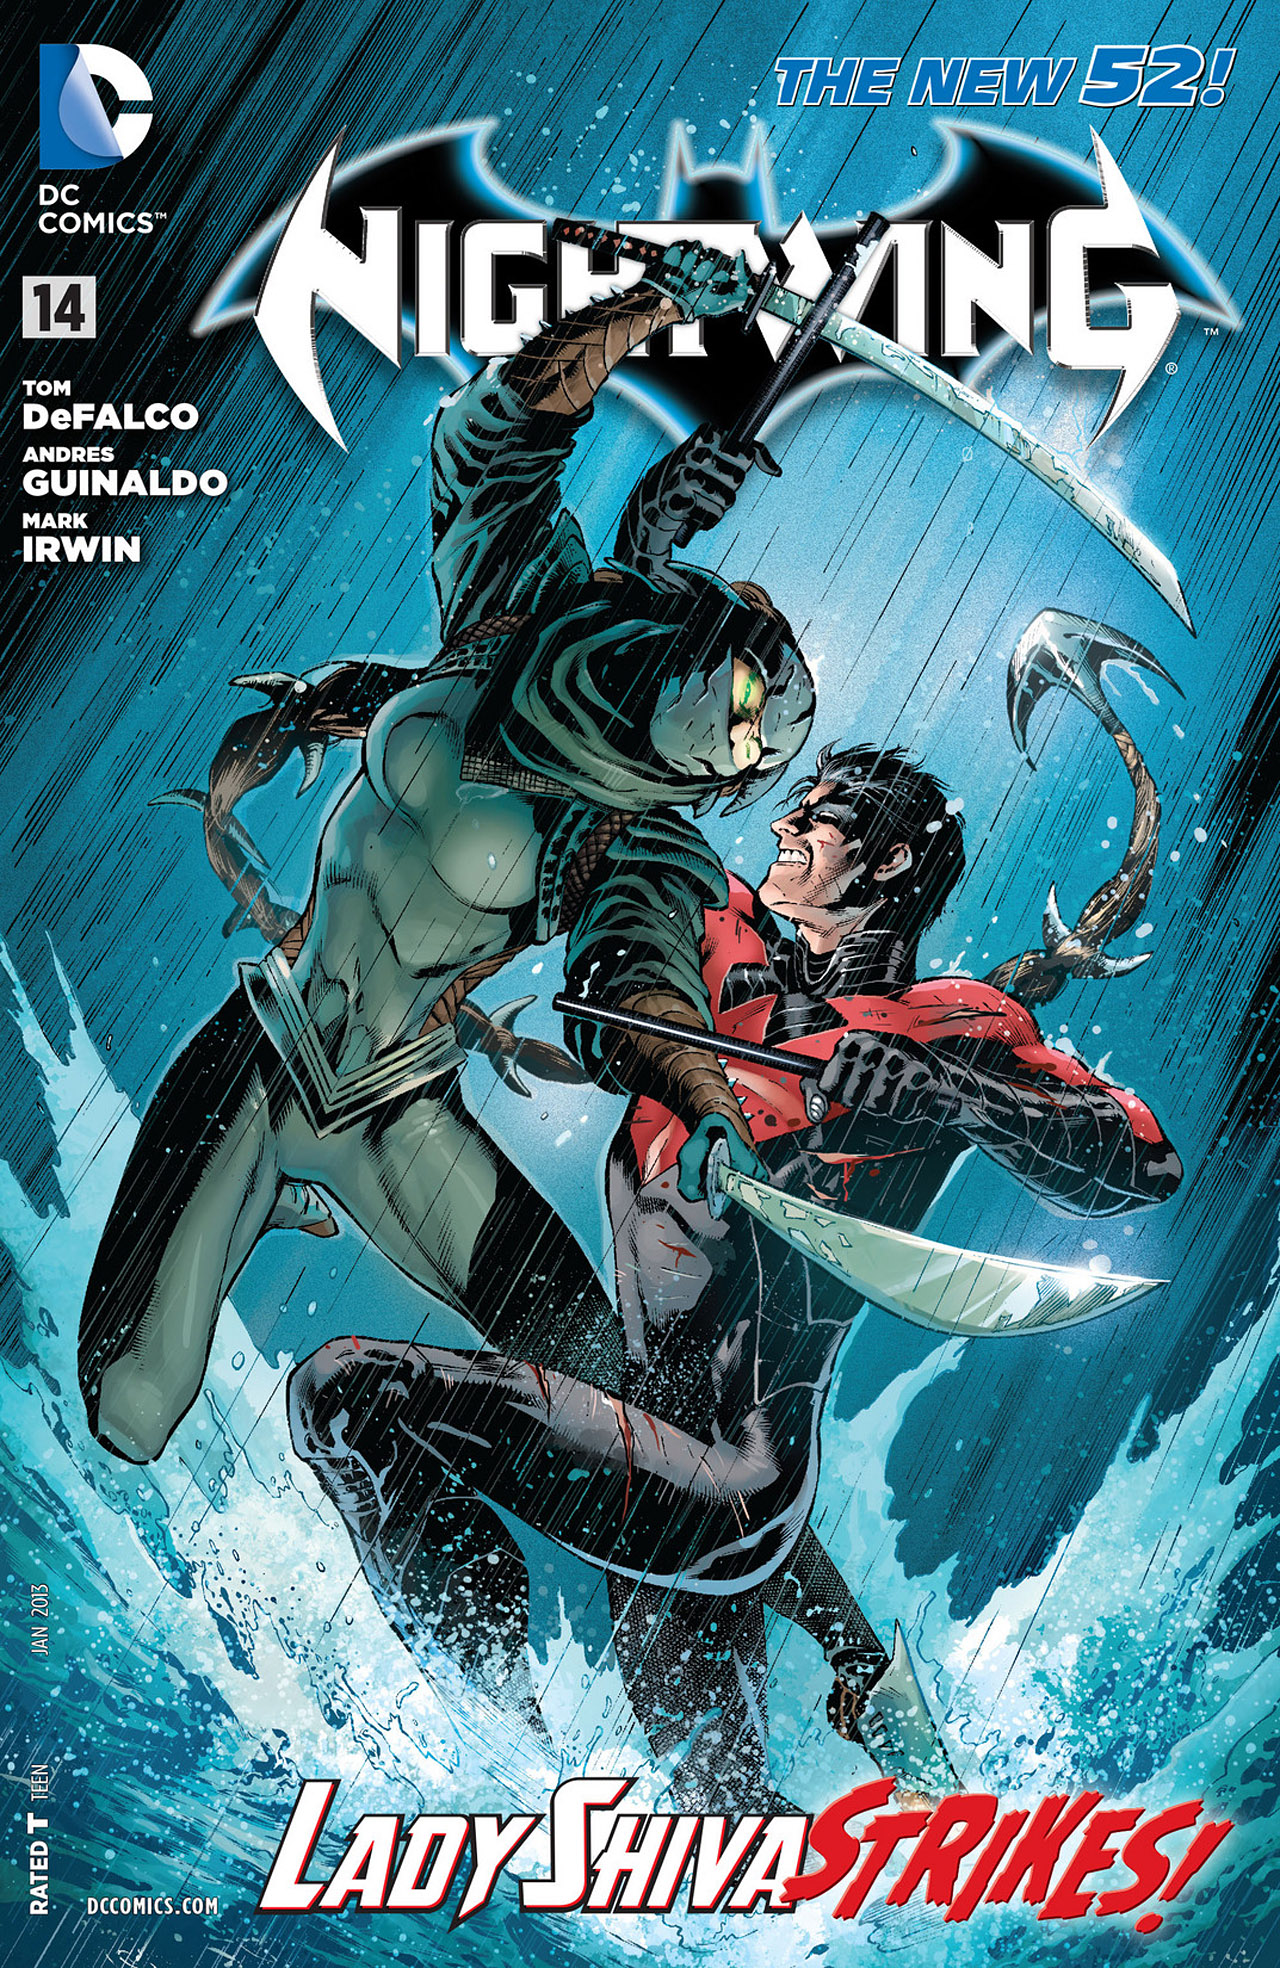 Nightwing Vol 3 14 | DC Database | FANDOM powered by Wikia